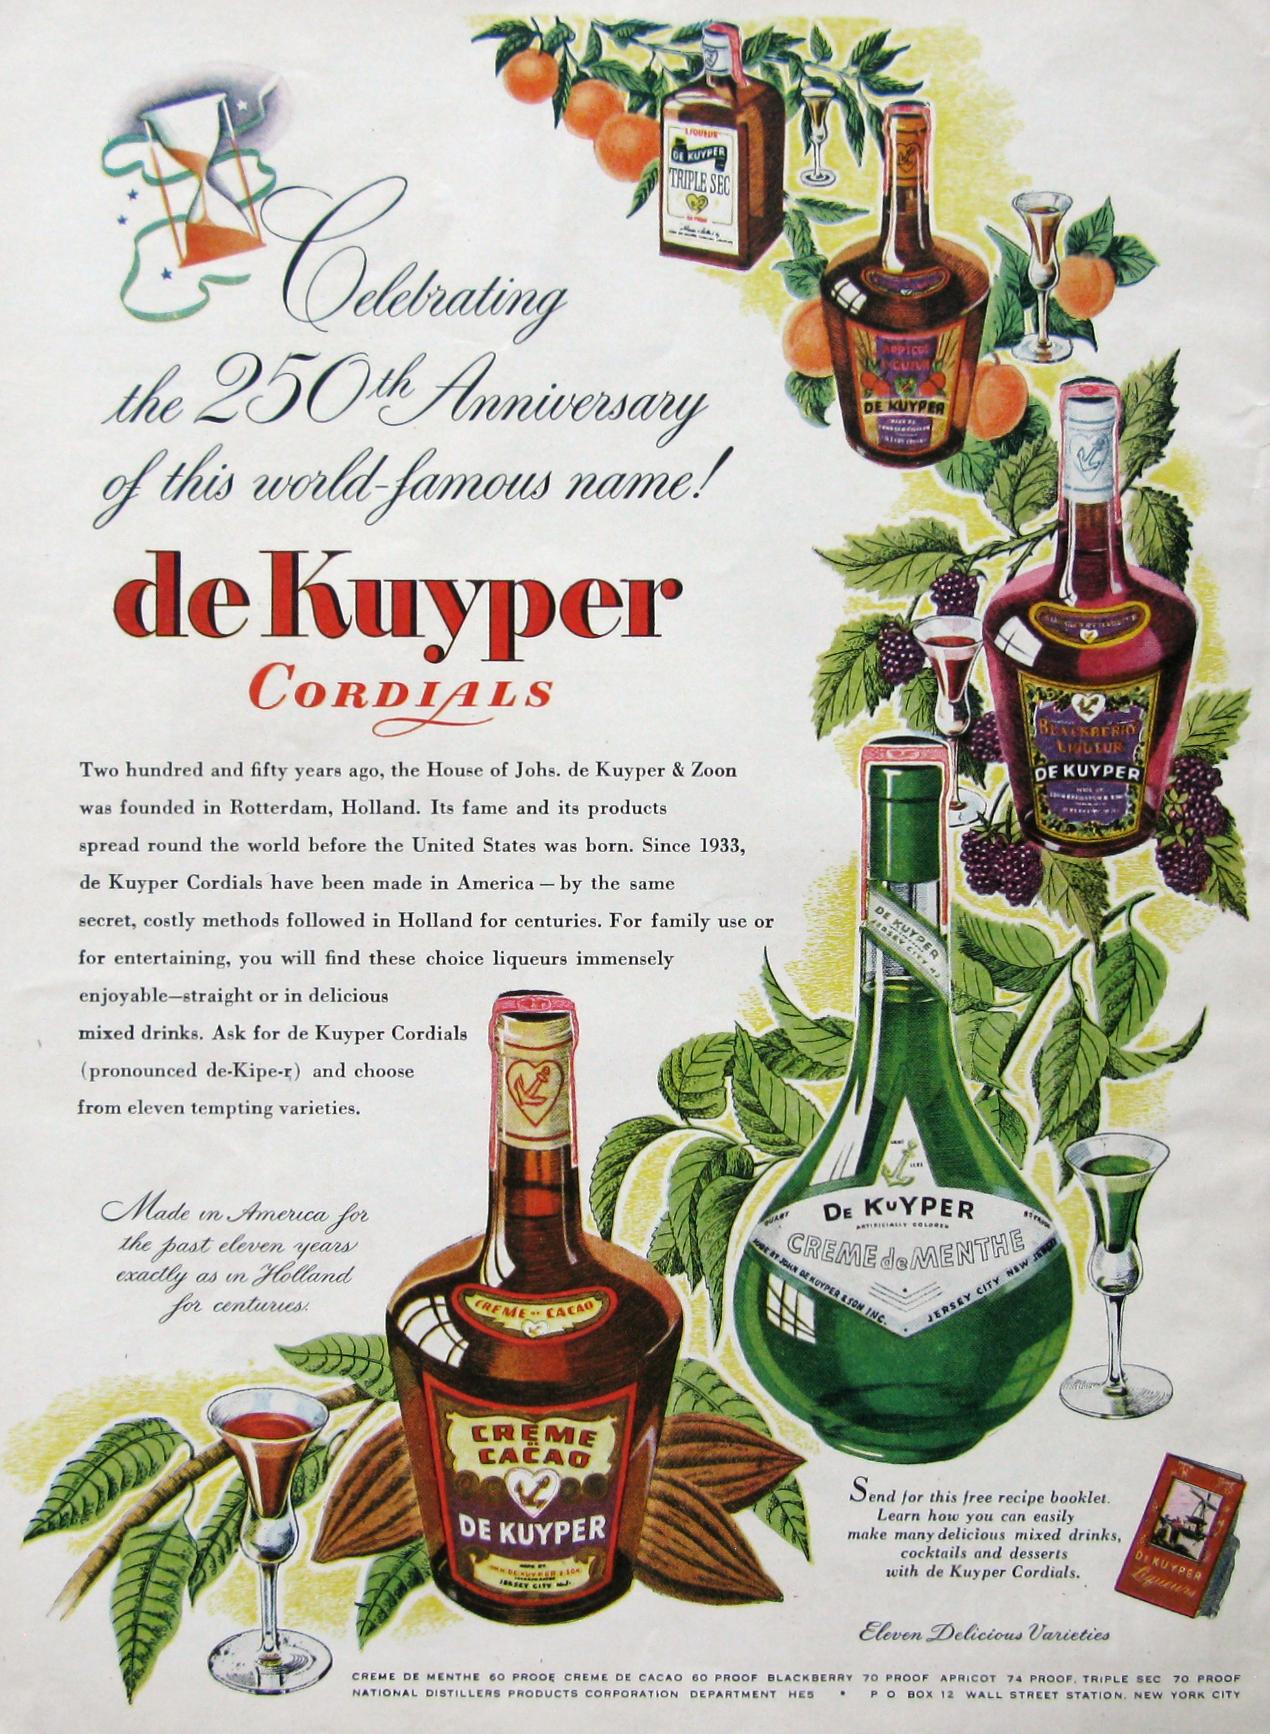 deKuyper Cordials ad 1945 from #RetroReveries